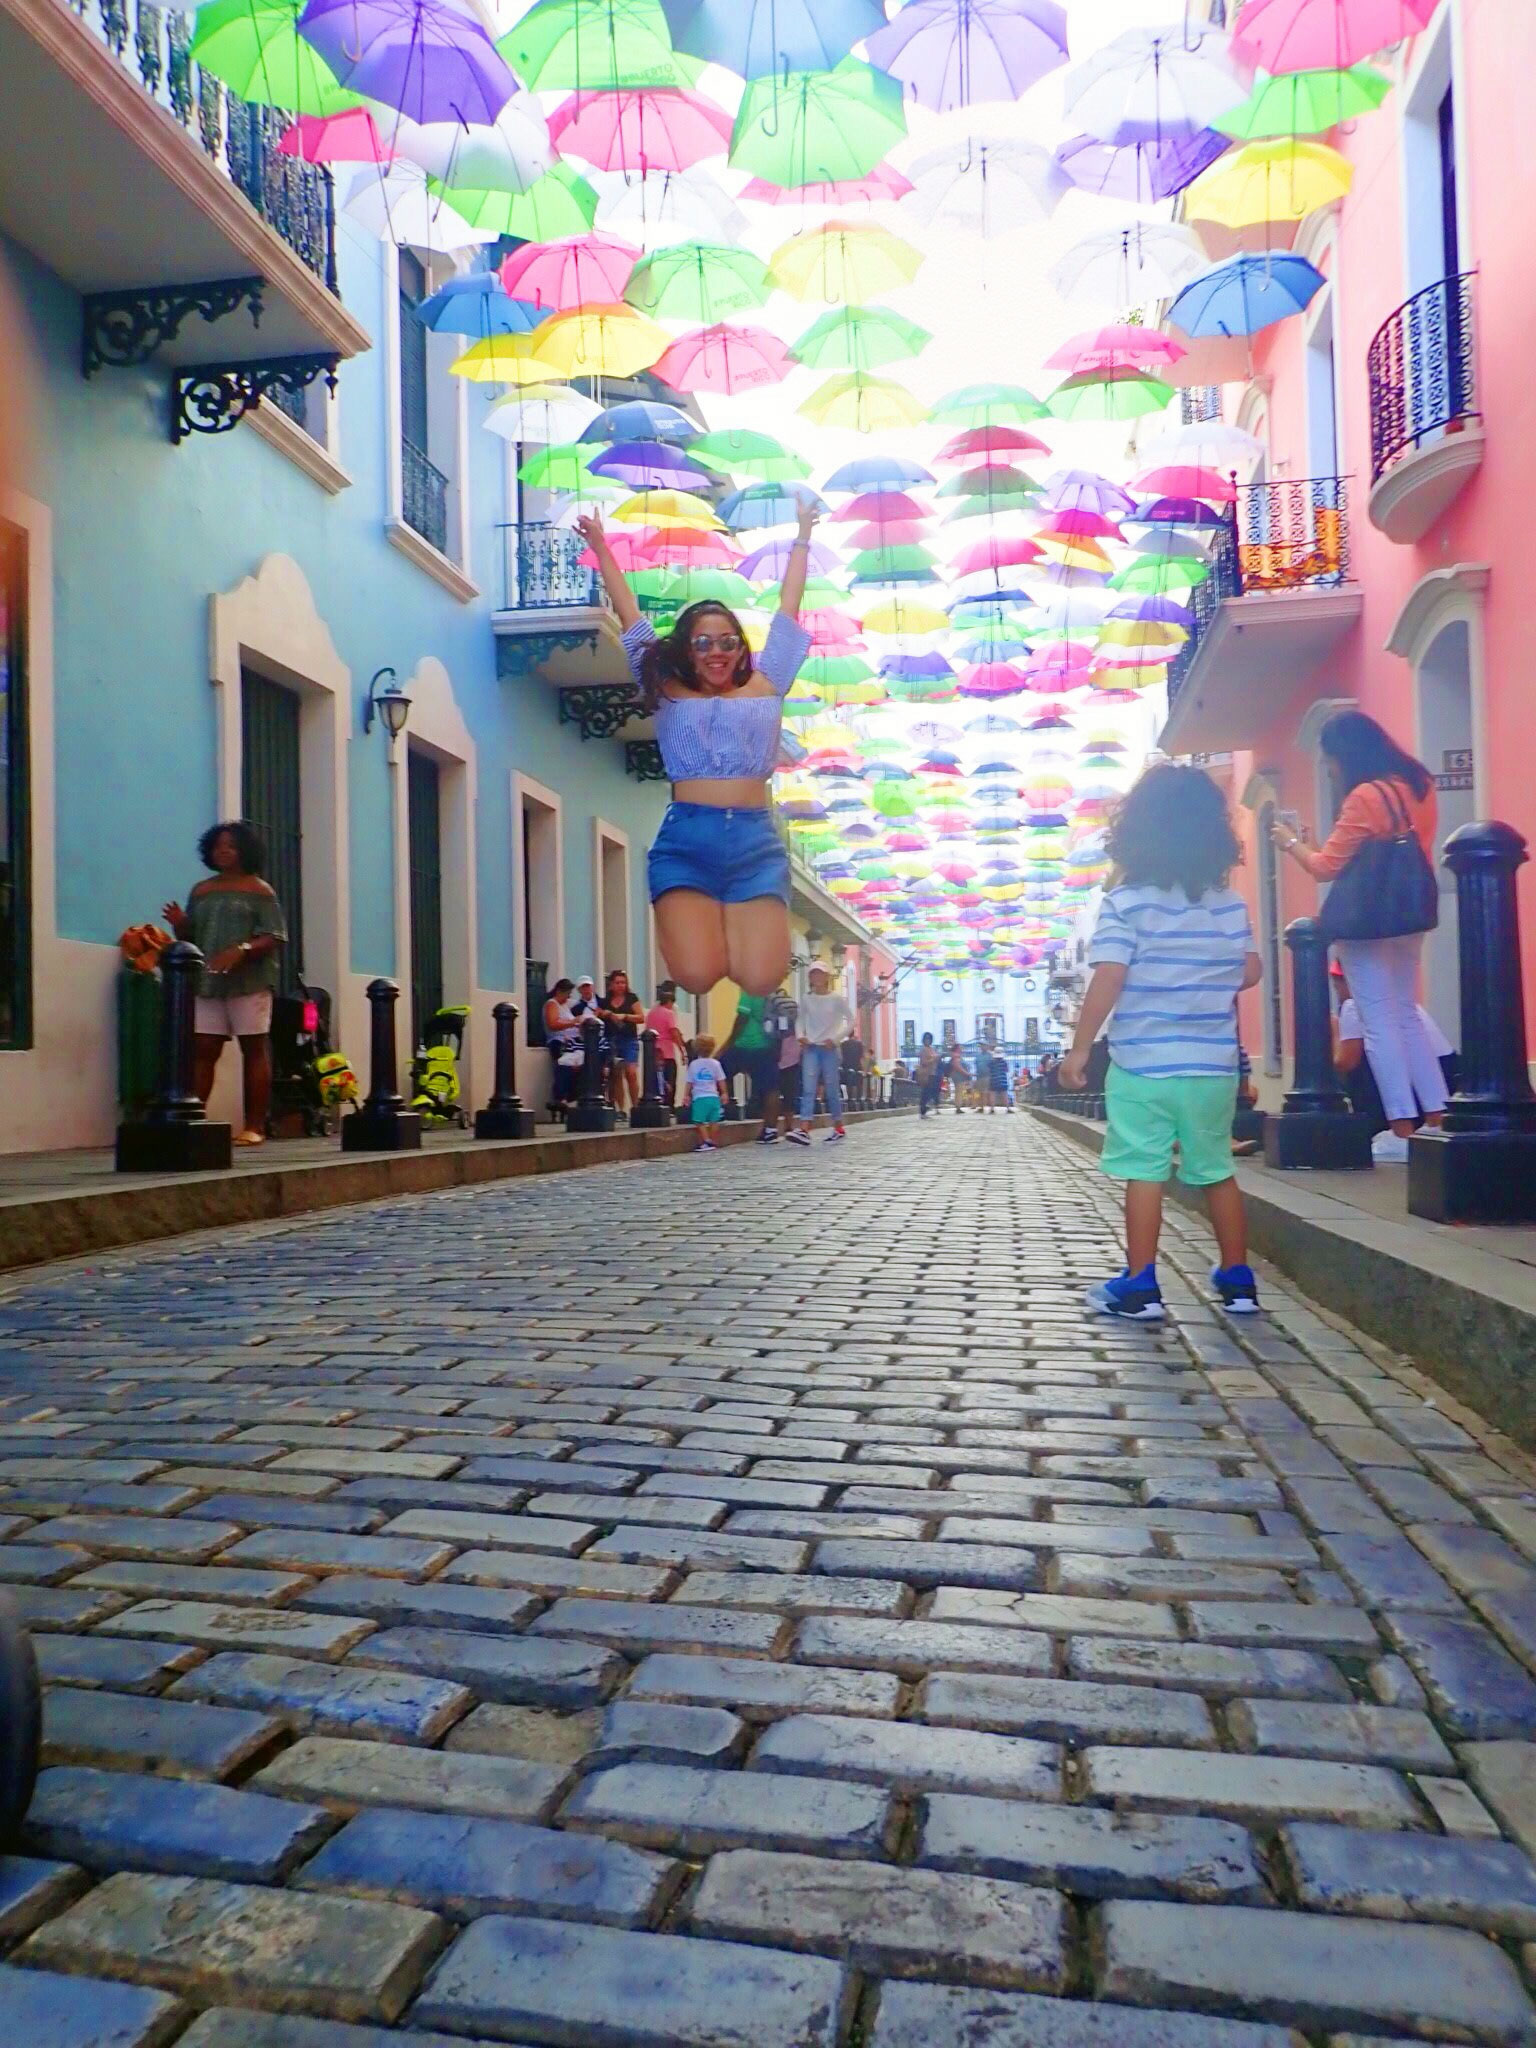 Paseo de las Sombrillas   Fortaleza Street   Old San Juan   Viejo San Juan   Things to do Old San Juan   Things to do Viejo San Juan   Puerto Rico Things To Do   www.anajacqueline.com